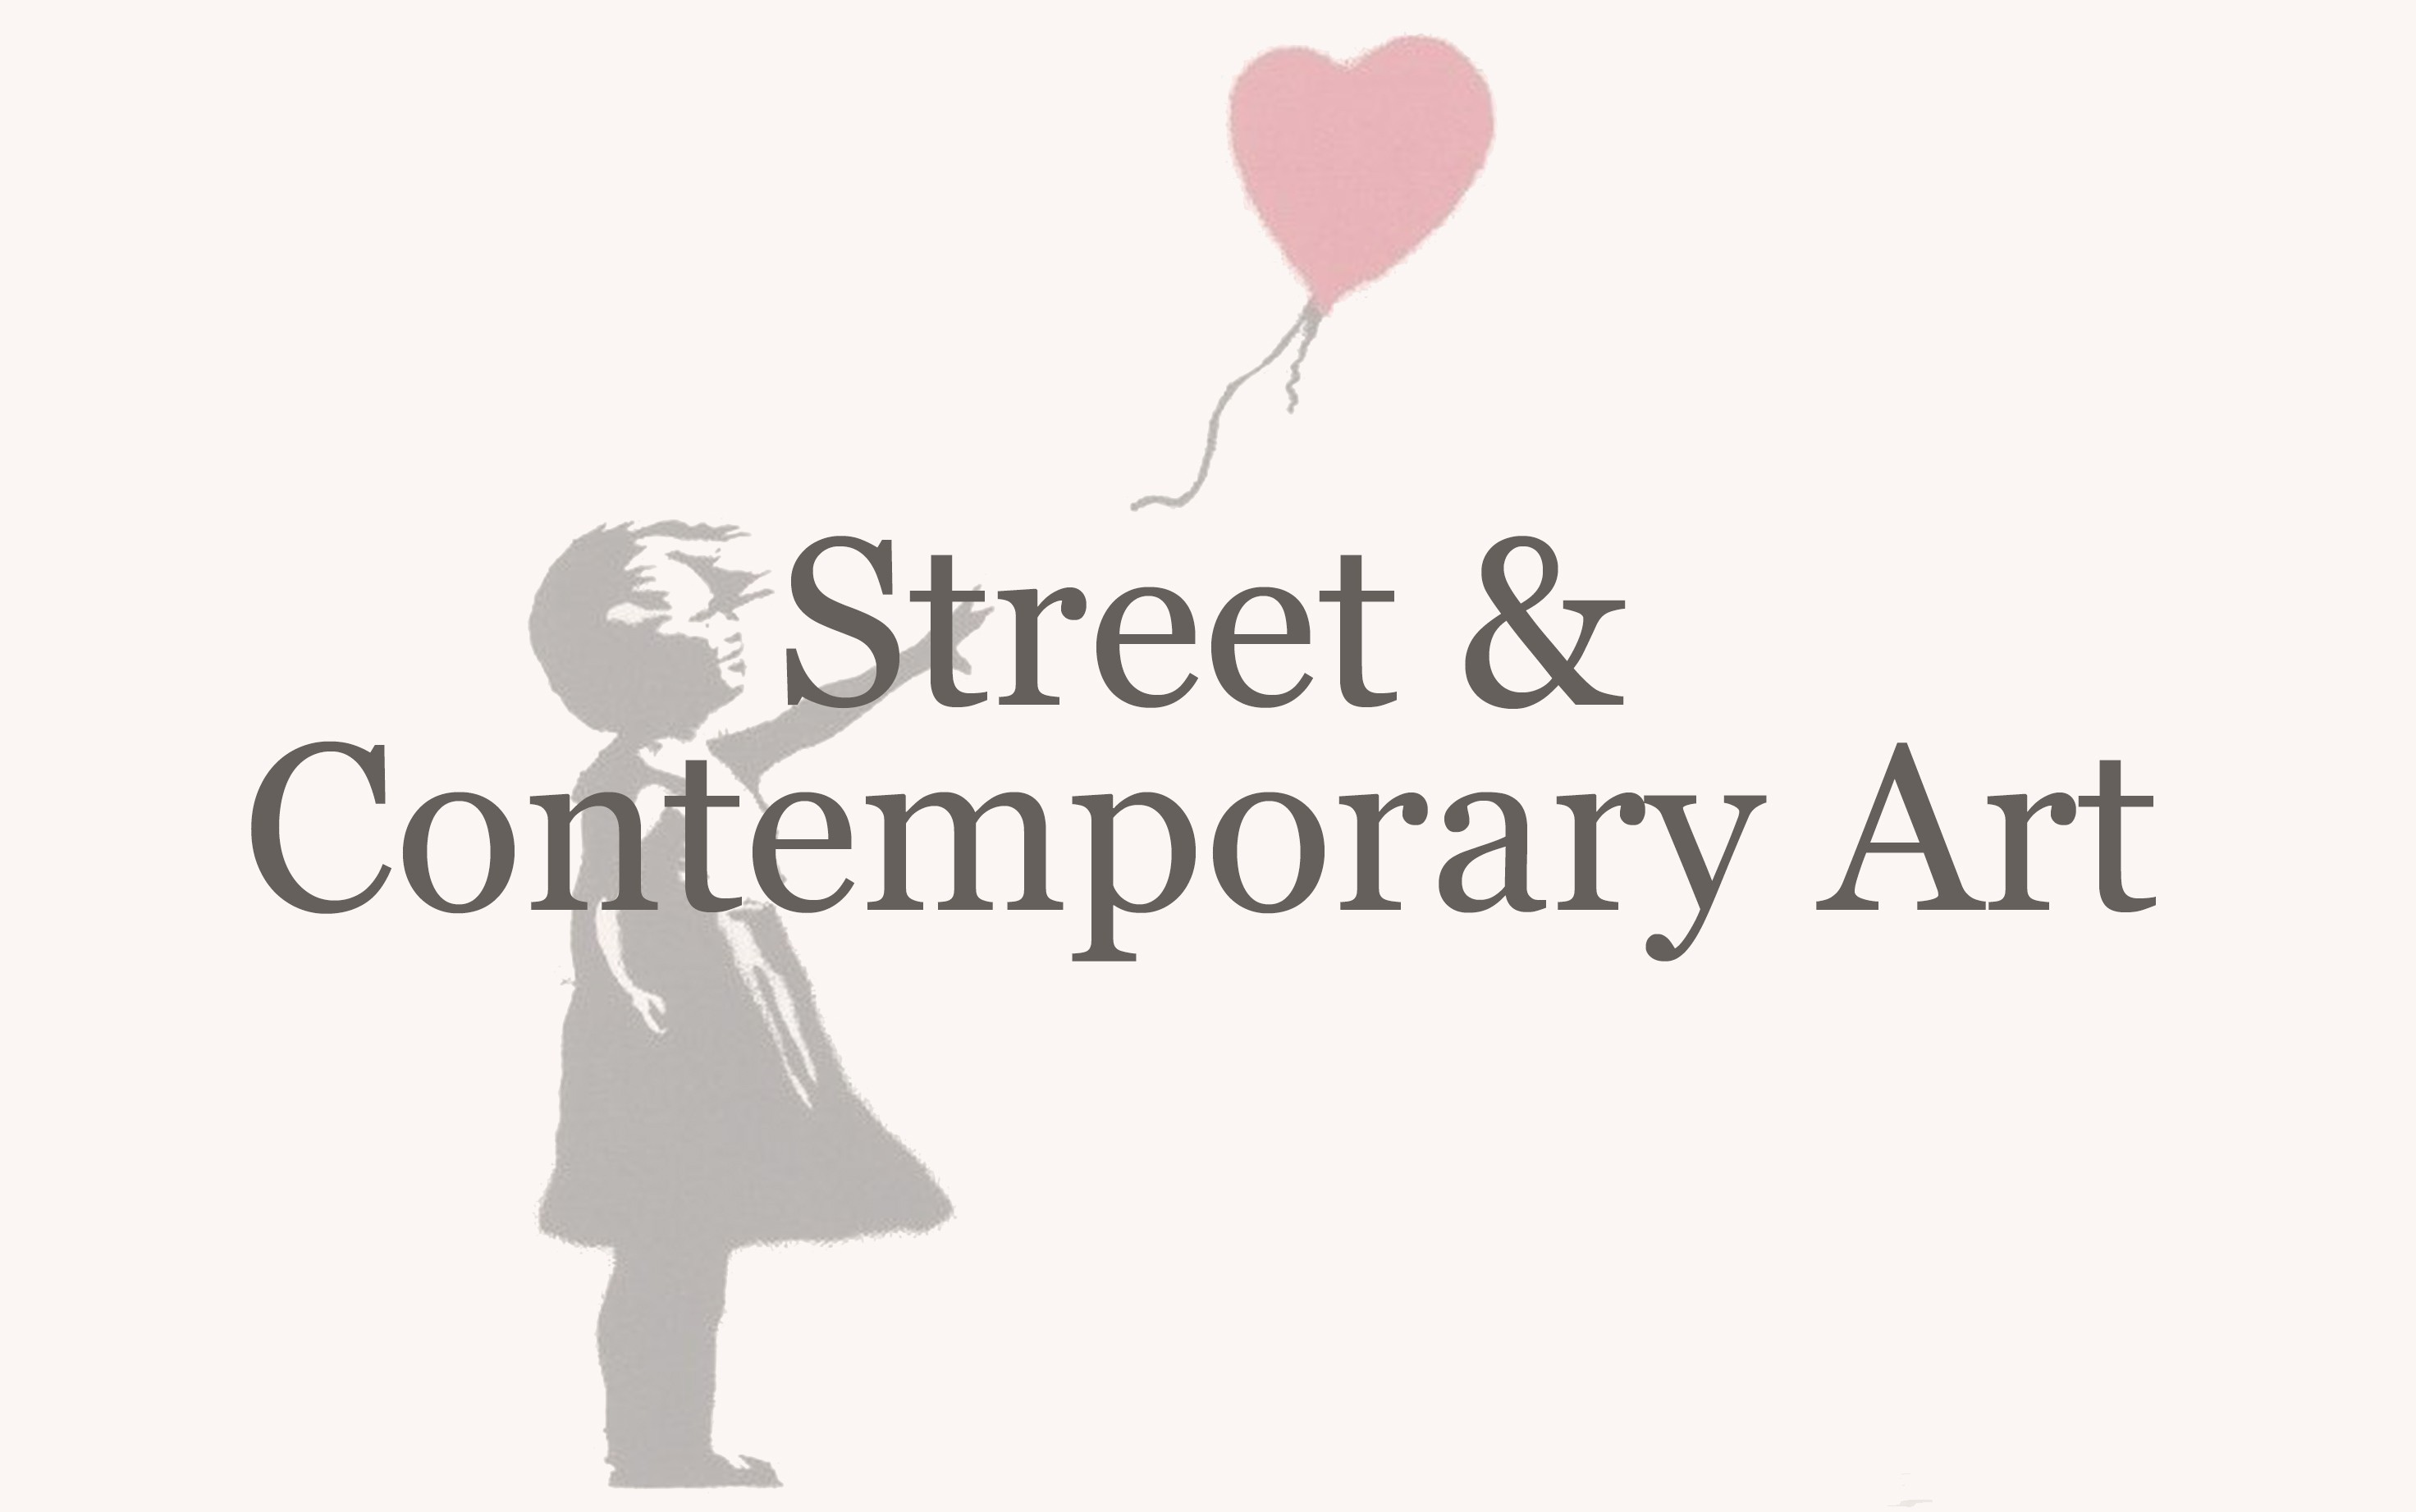 Street & Contemporary Art